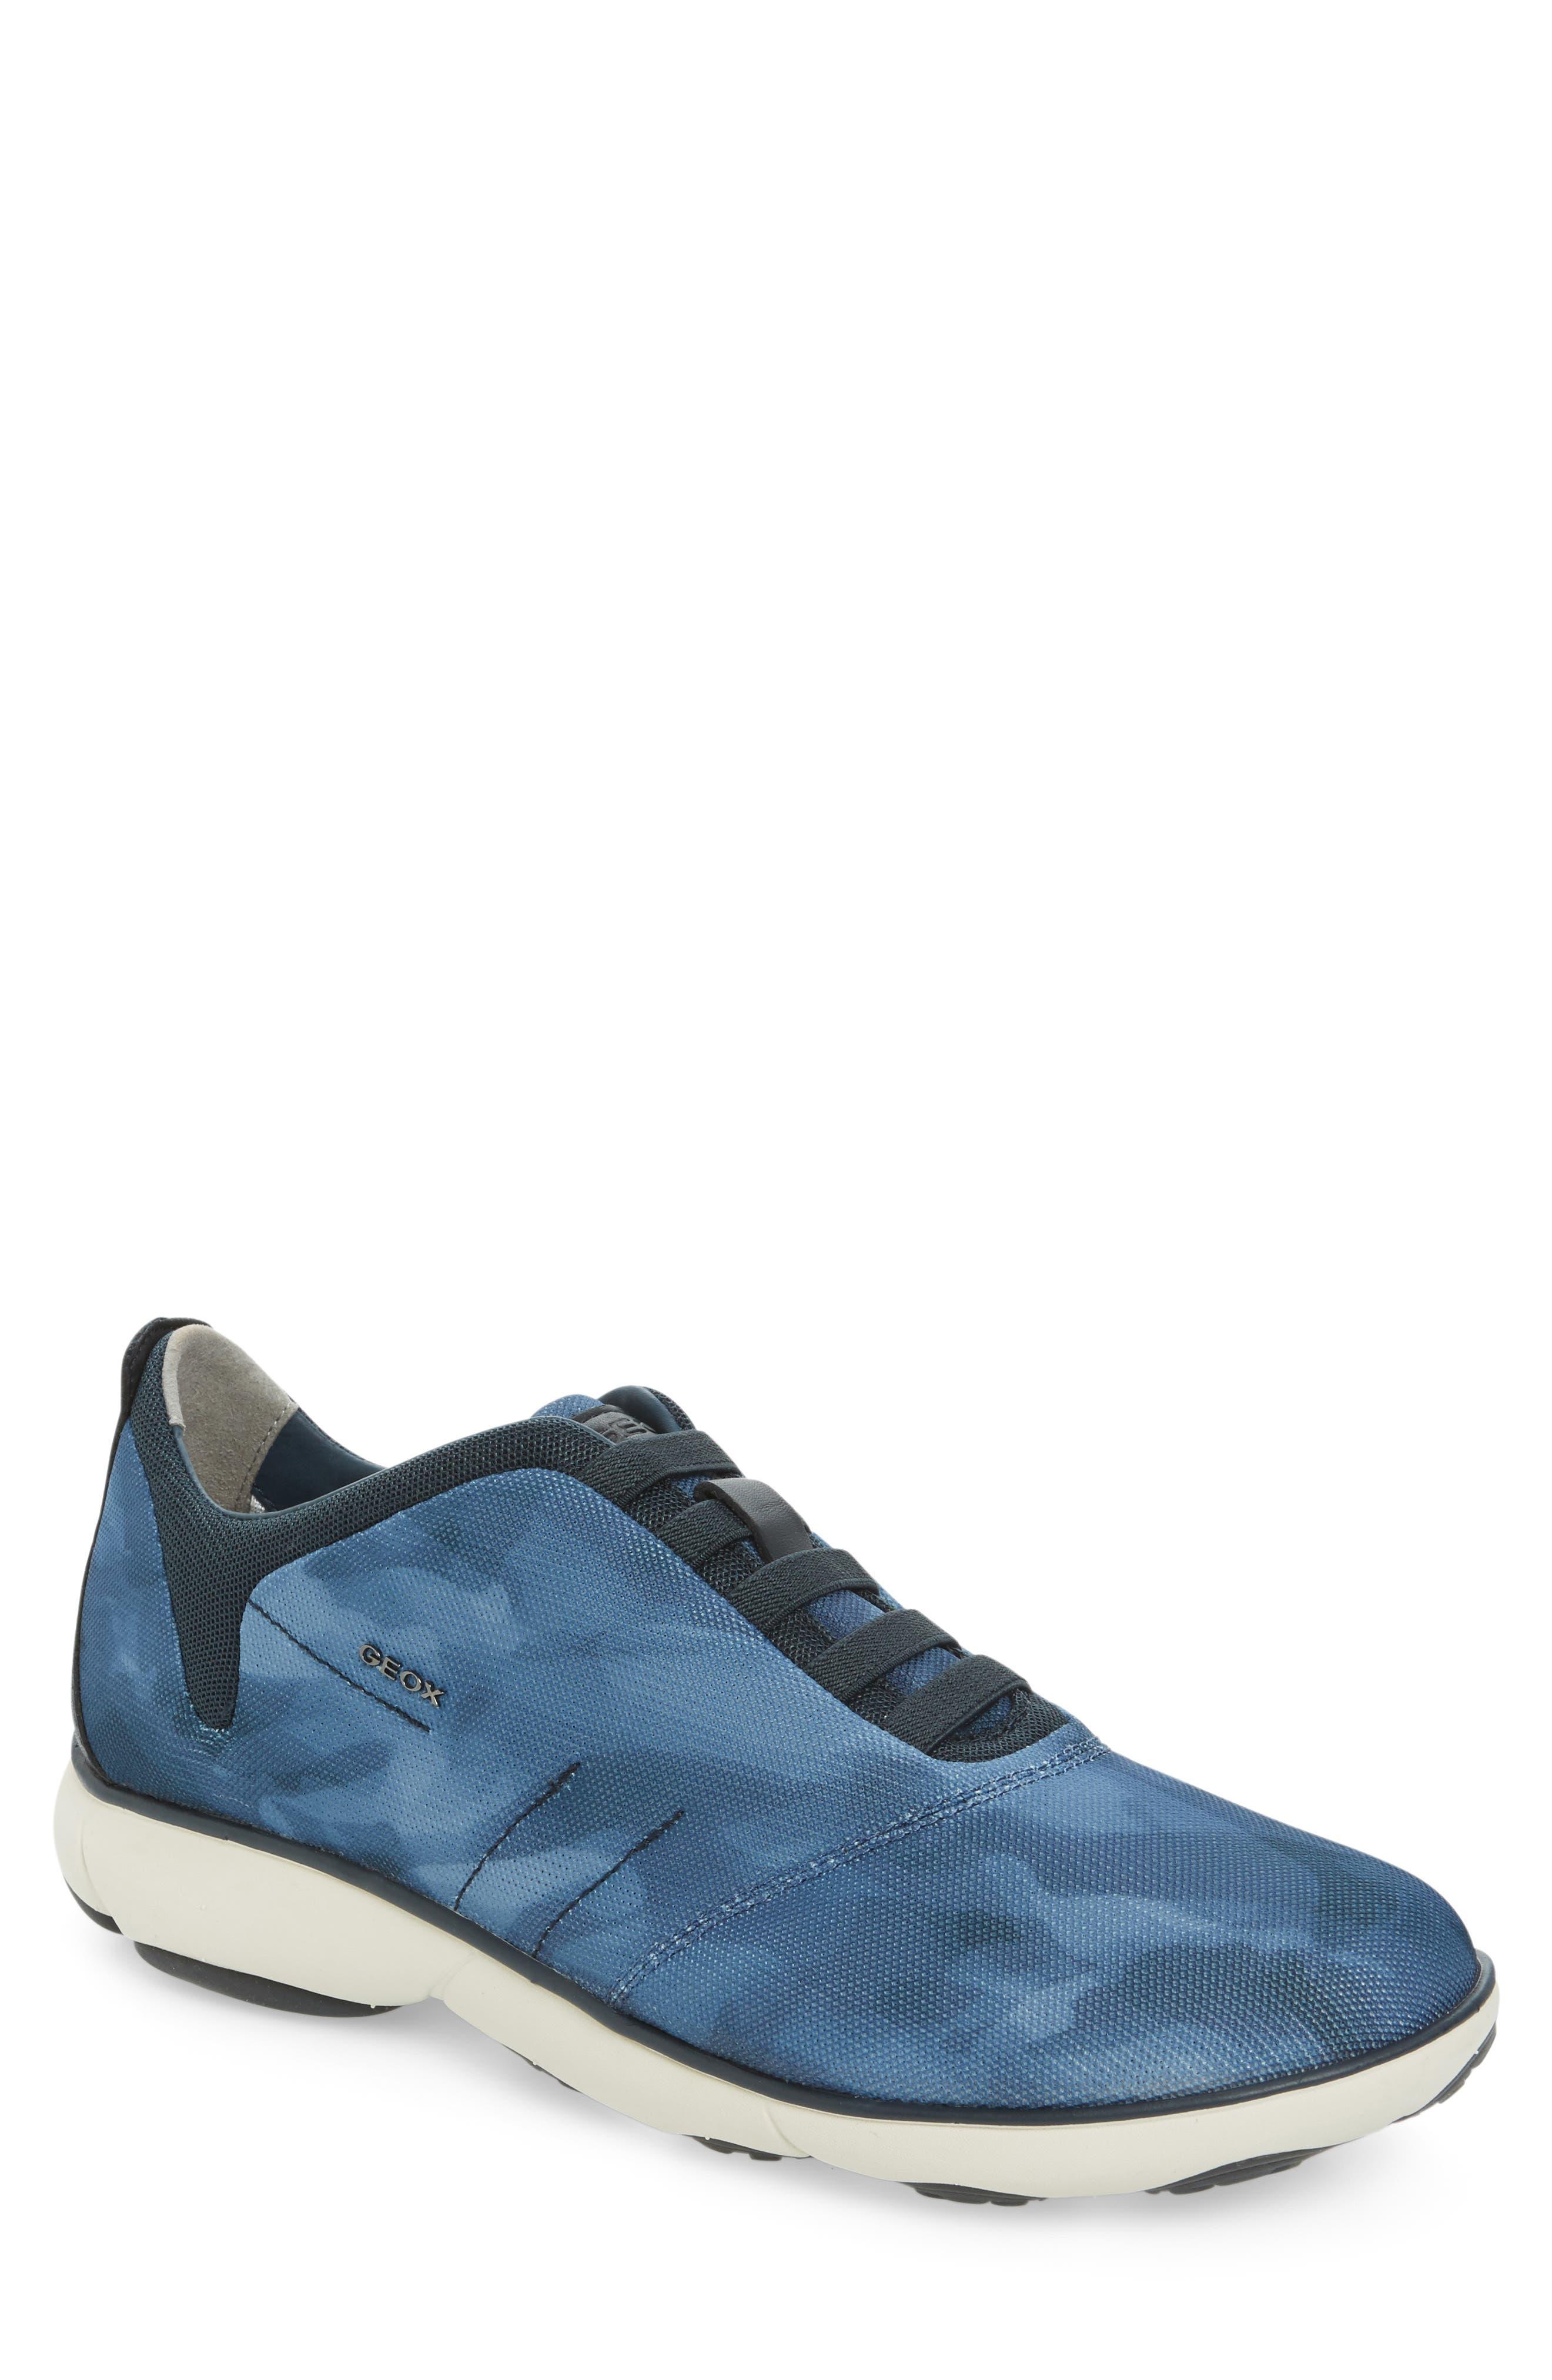 Nebula 26 Sneaker,                             Main thumbnail 2, color,